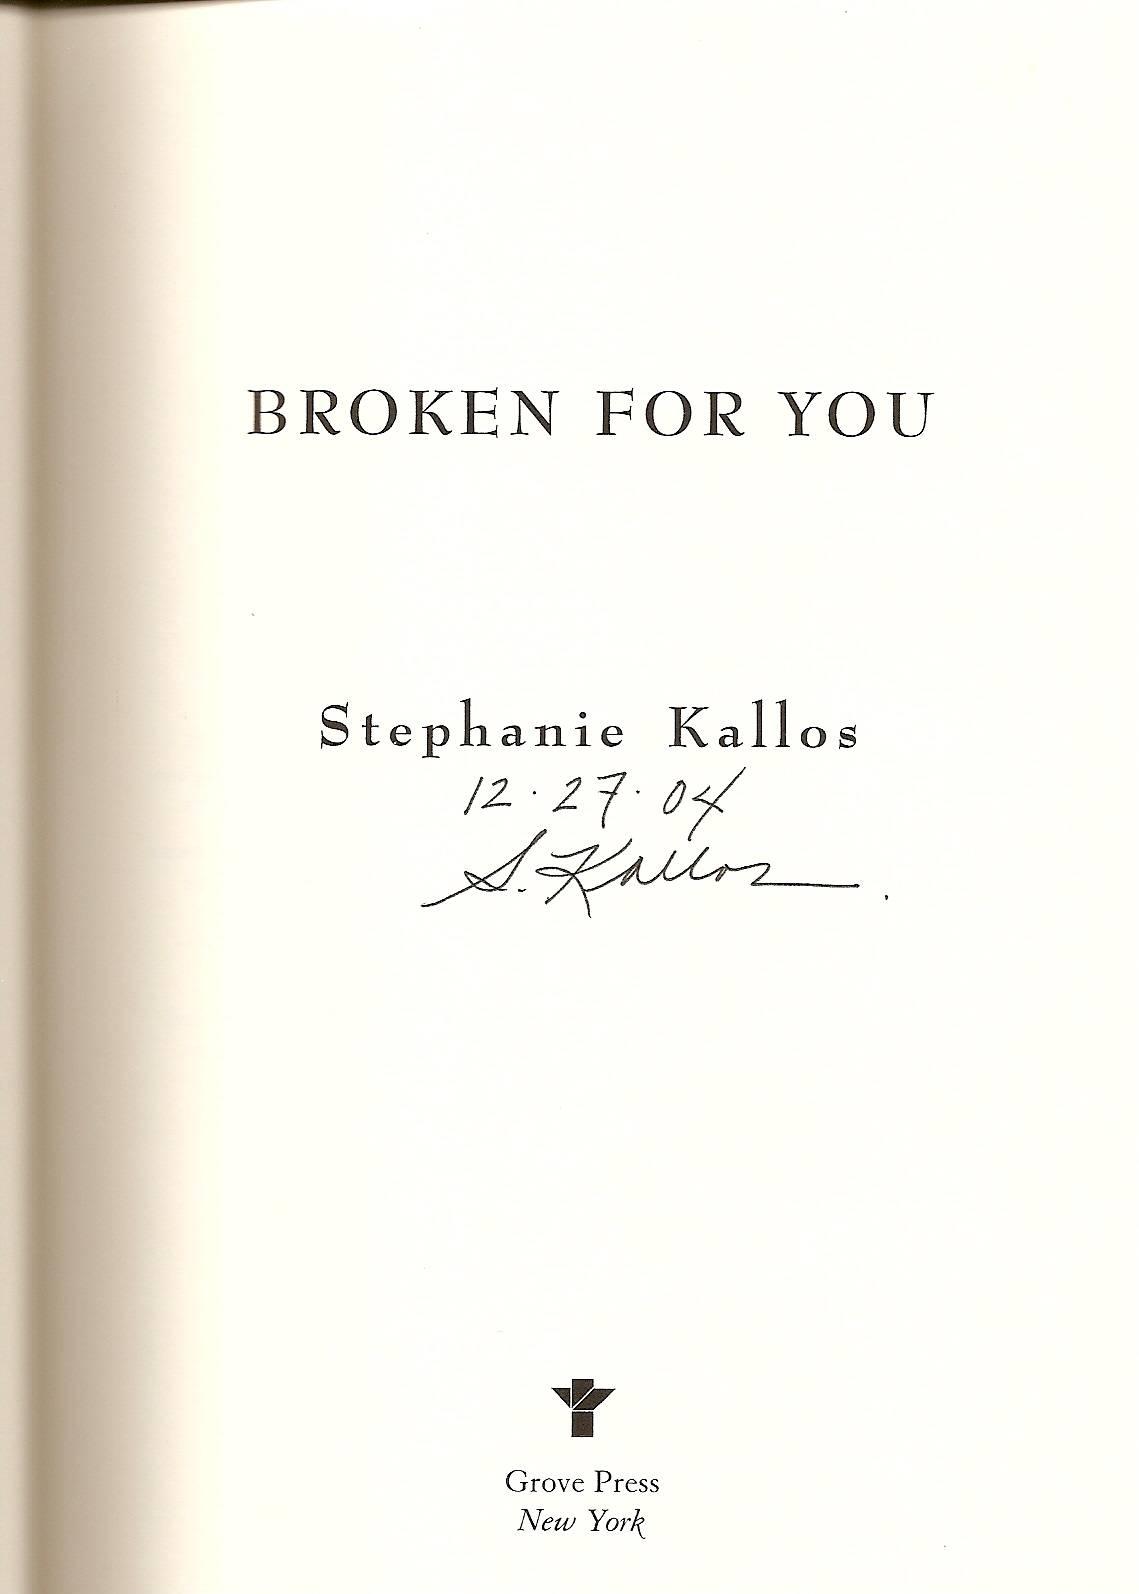 Stephanie Kallos